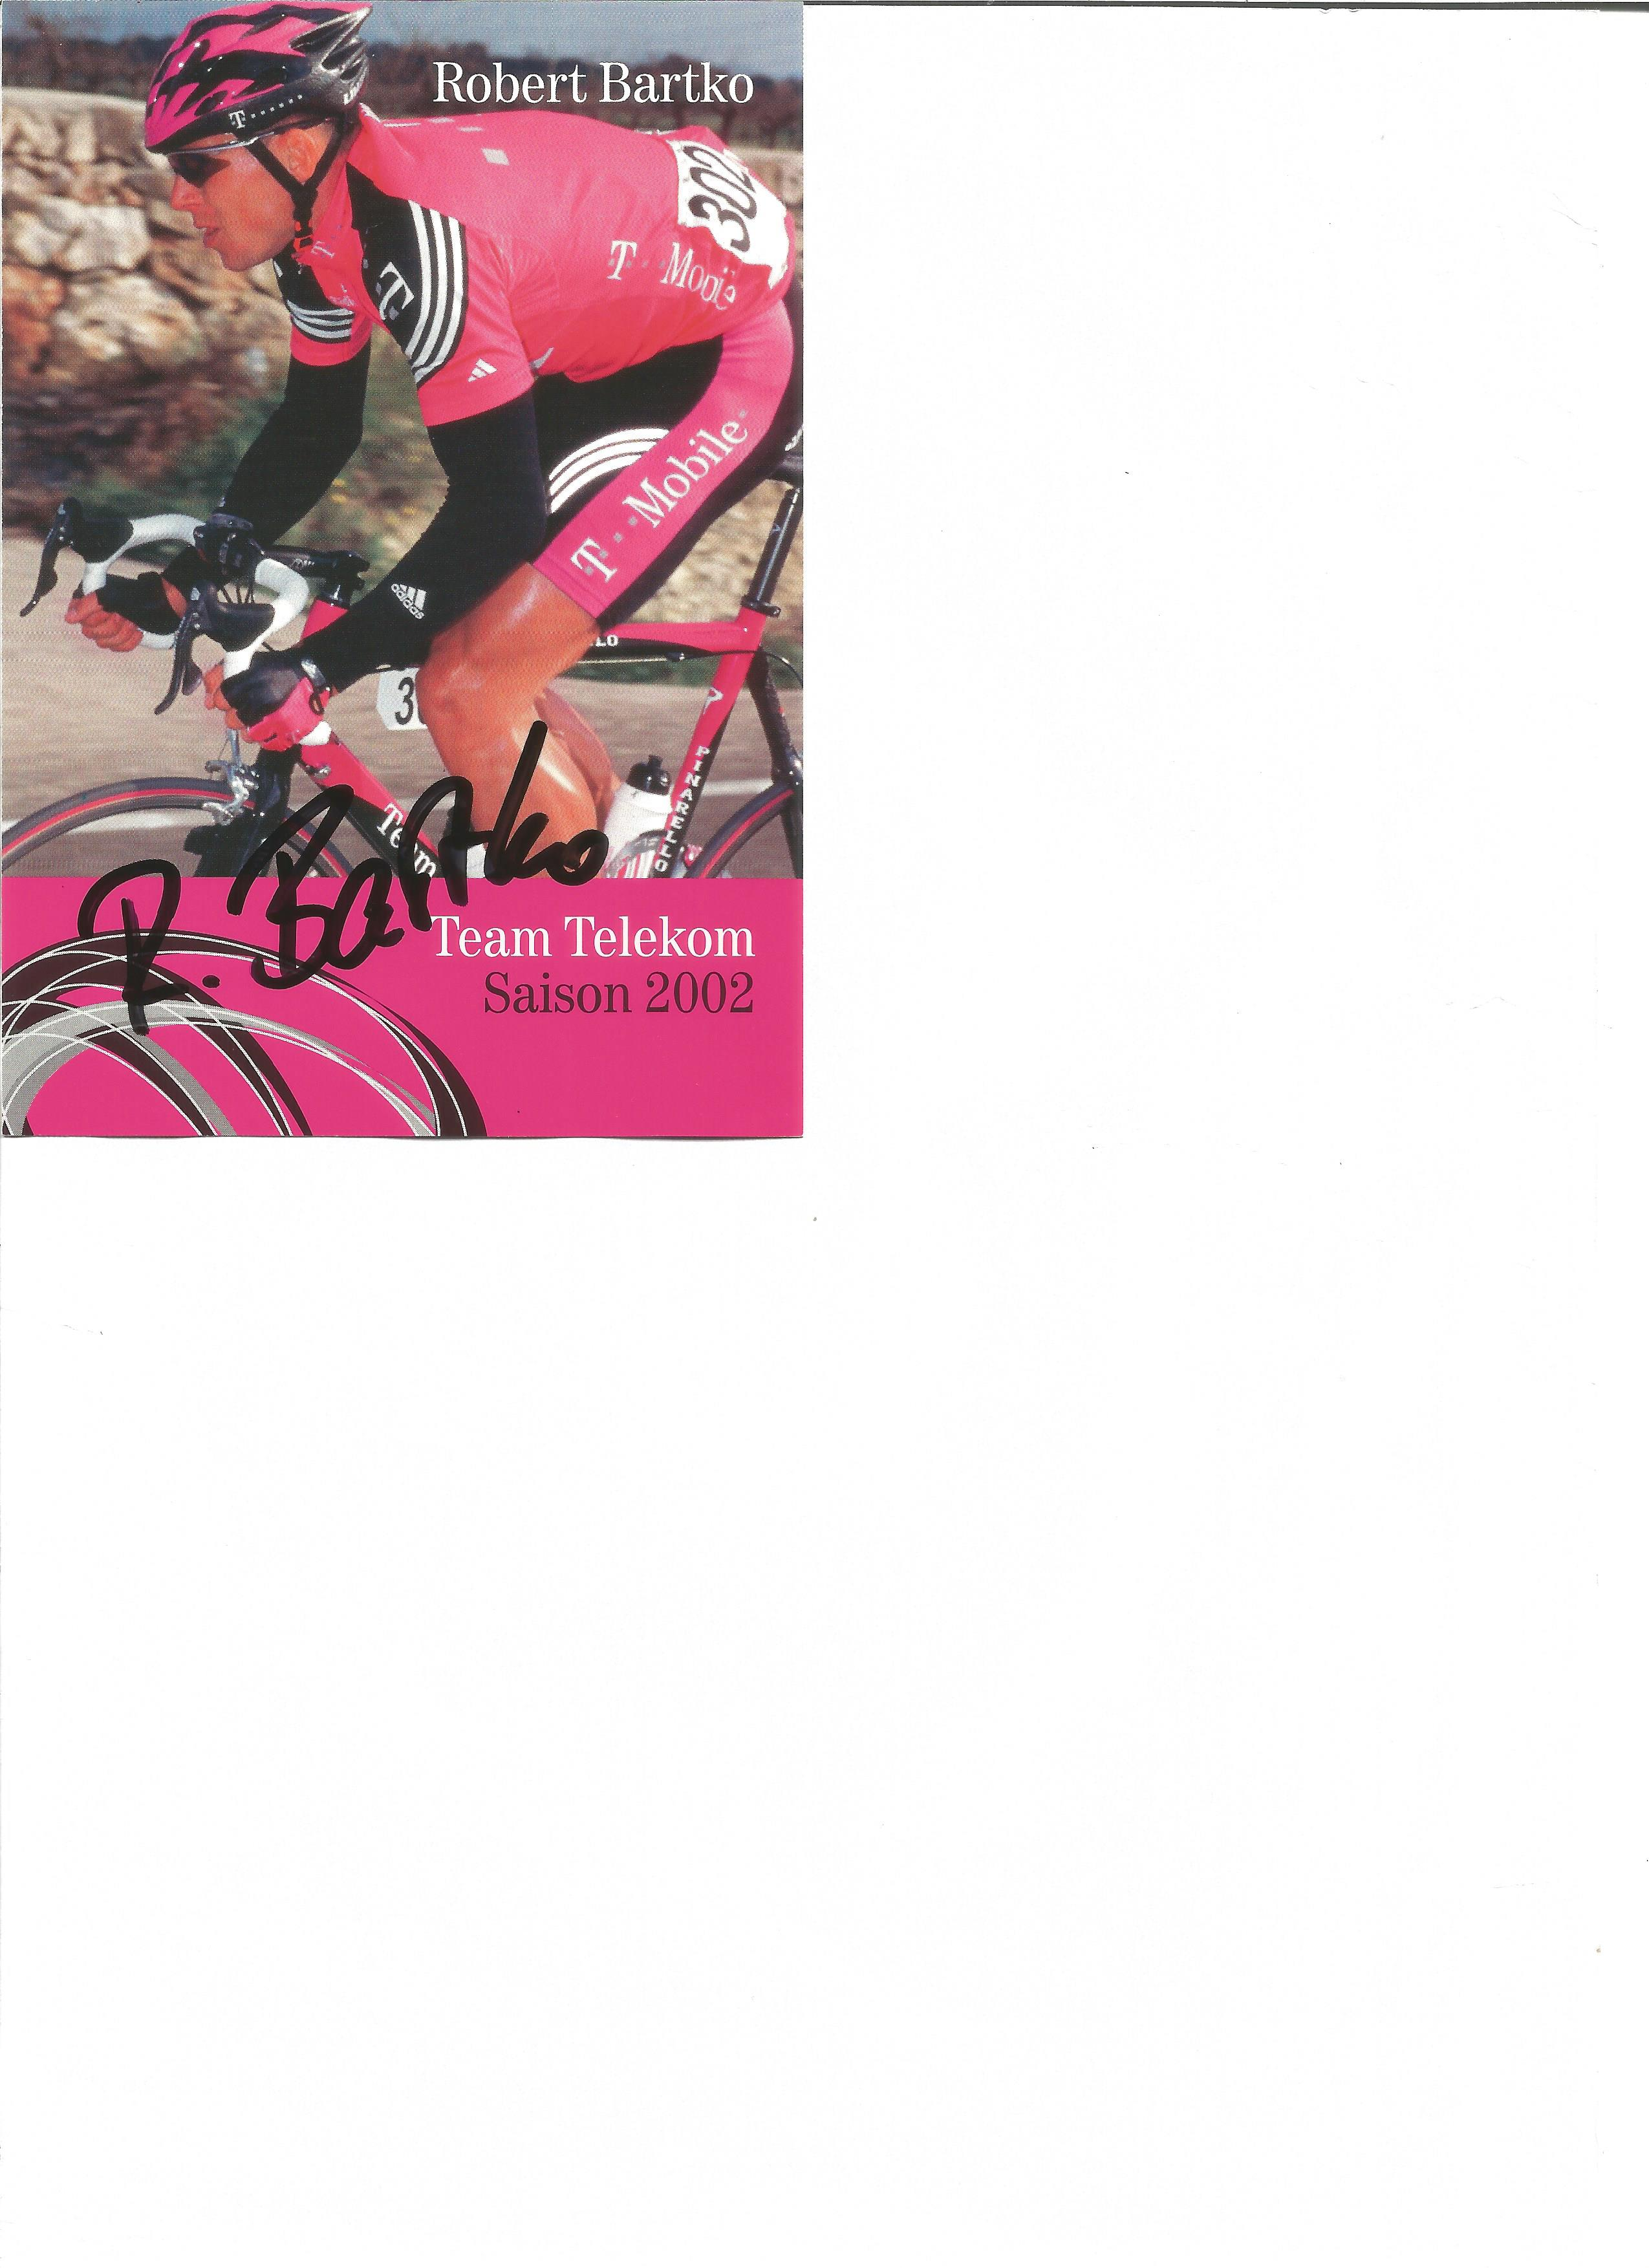 Lot 143 - Cycling Robert Bartko signed 6 x 4 inch promo photo. Robert Bartko born 23 December 1975 in